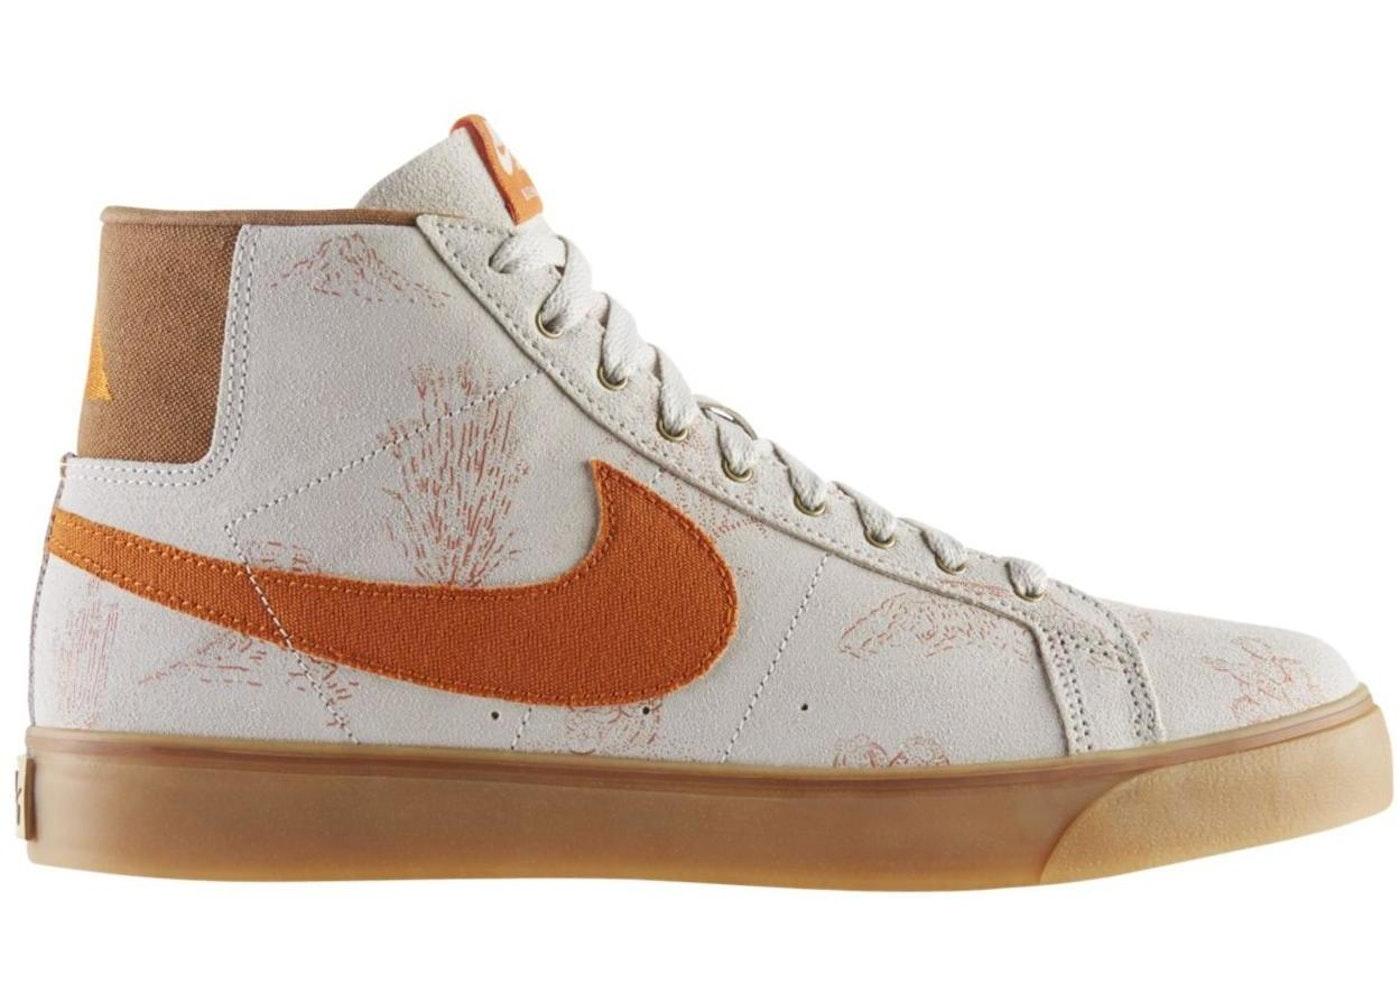 Nike SB Blazer. Canvas Light Brown